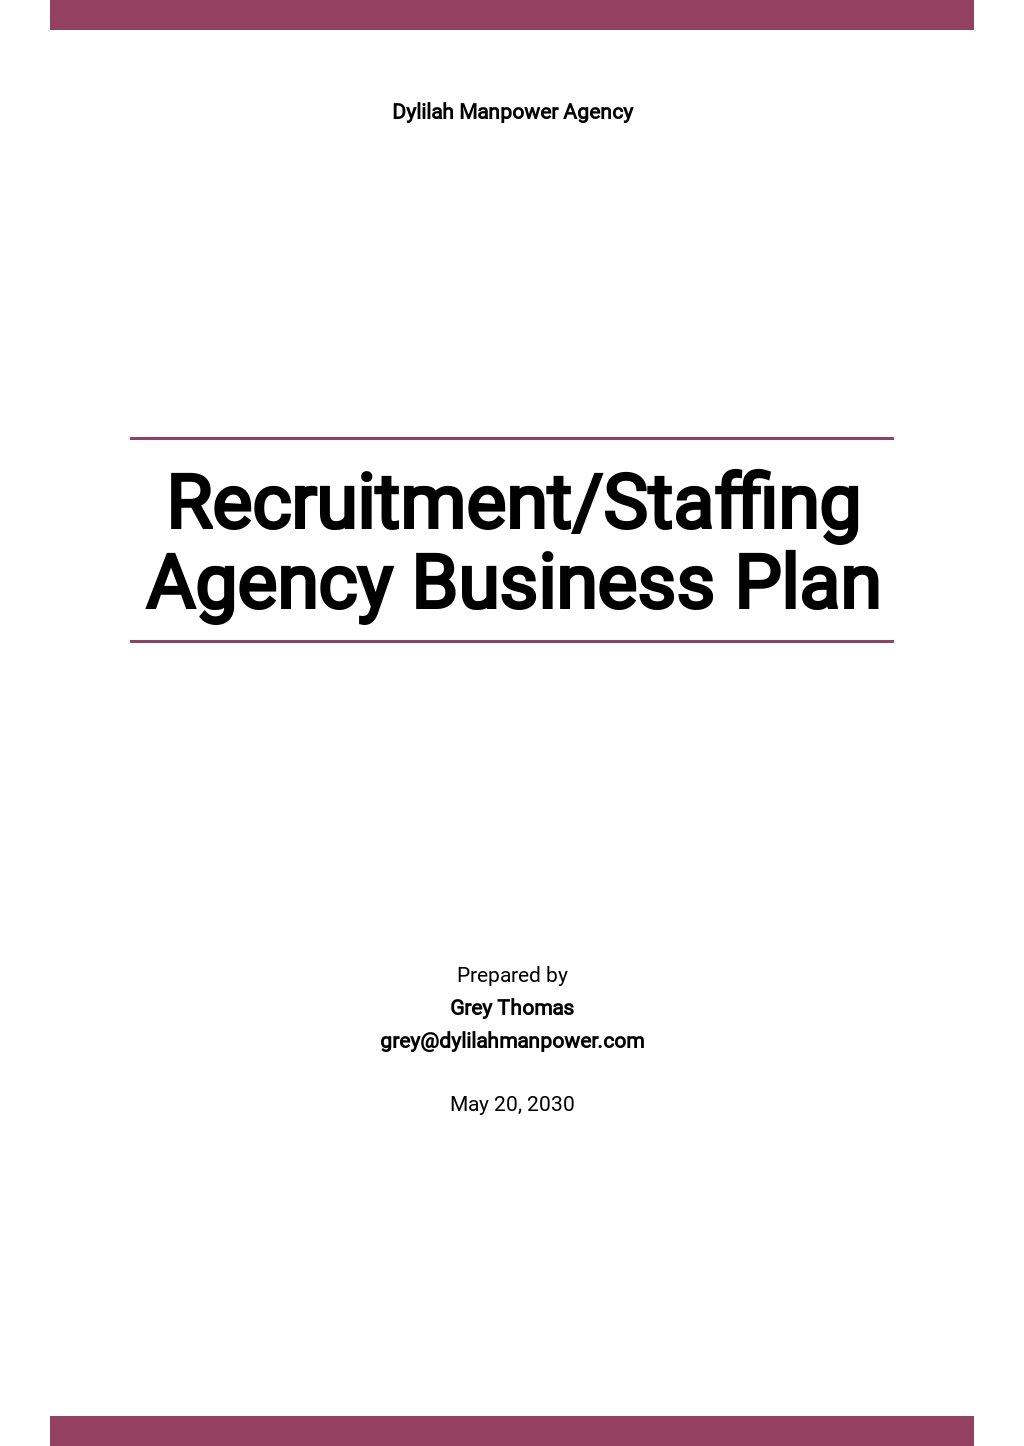 Recruitment/Staffing Agency Business Plan Template.jpe